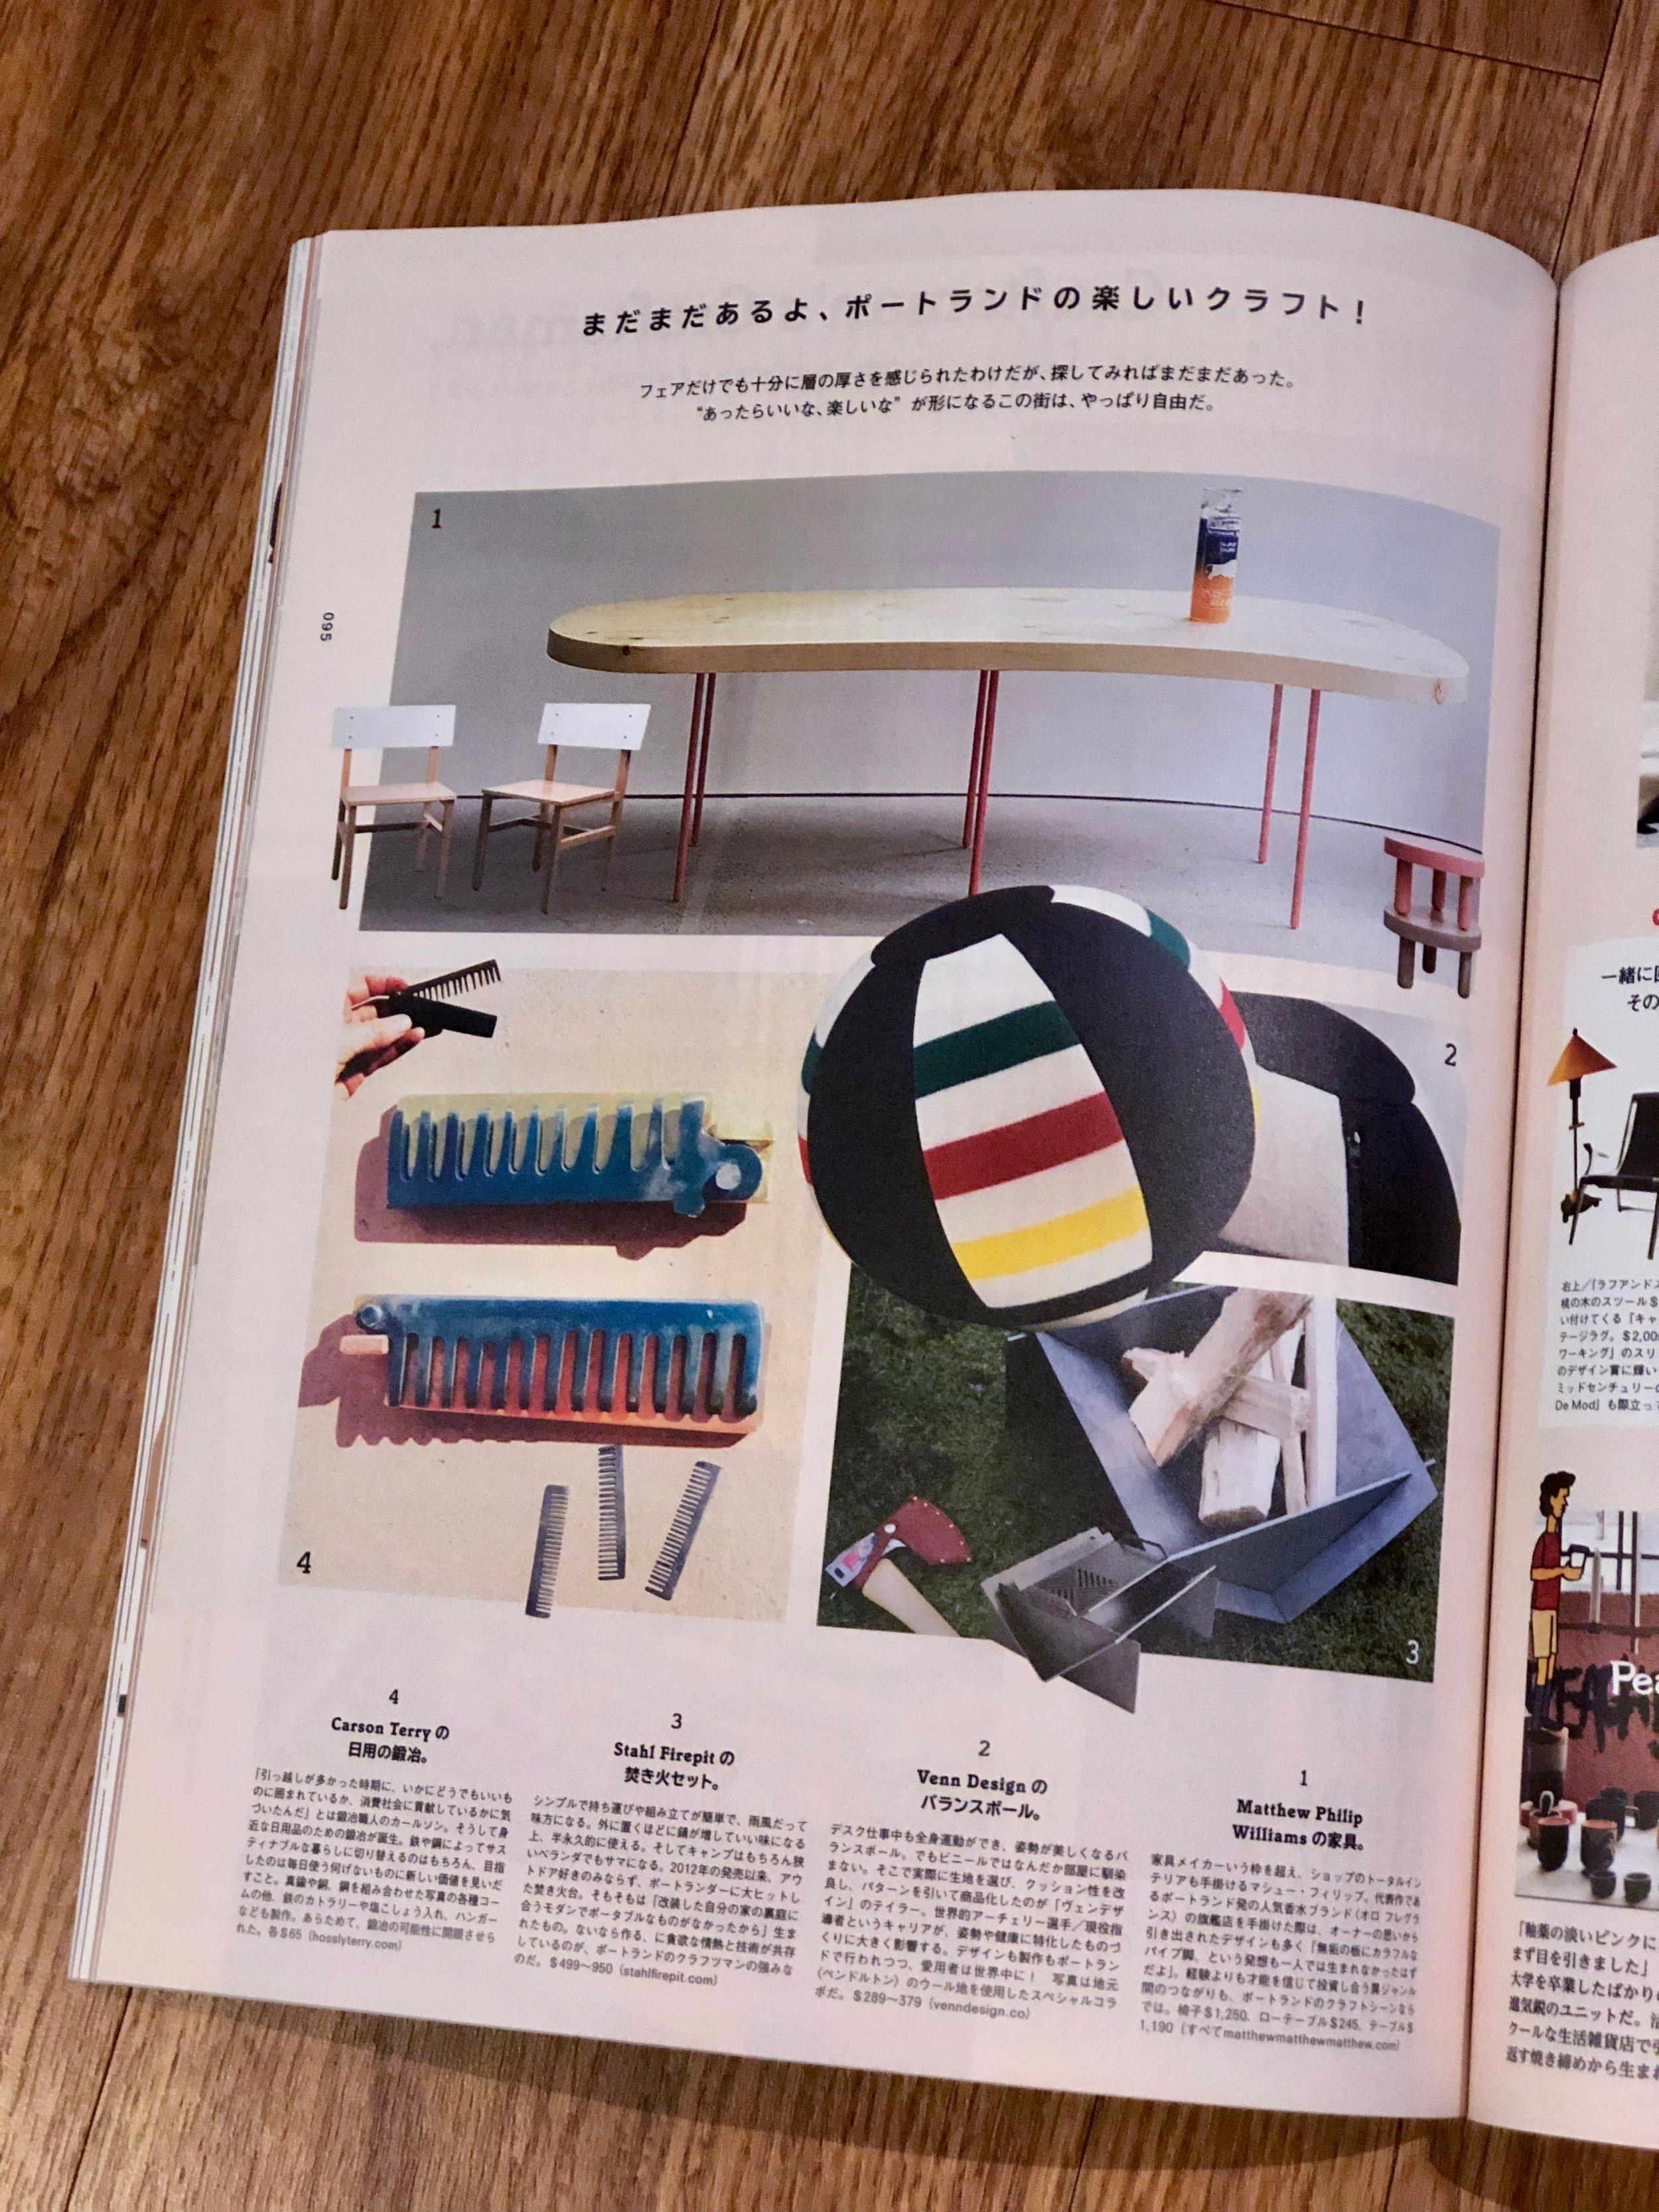 Popeye Magazine Craftsmanship feature on Venn Design